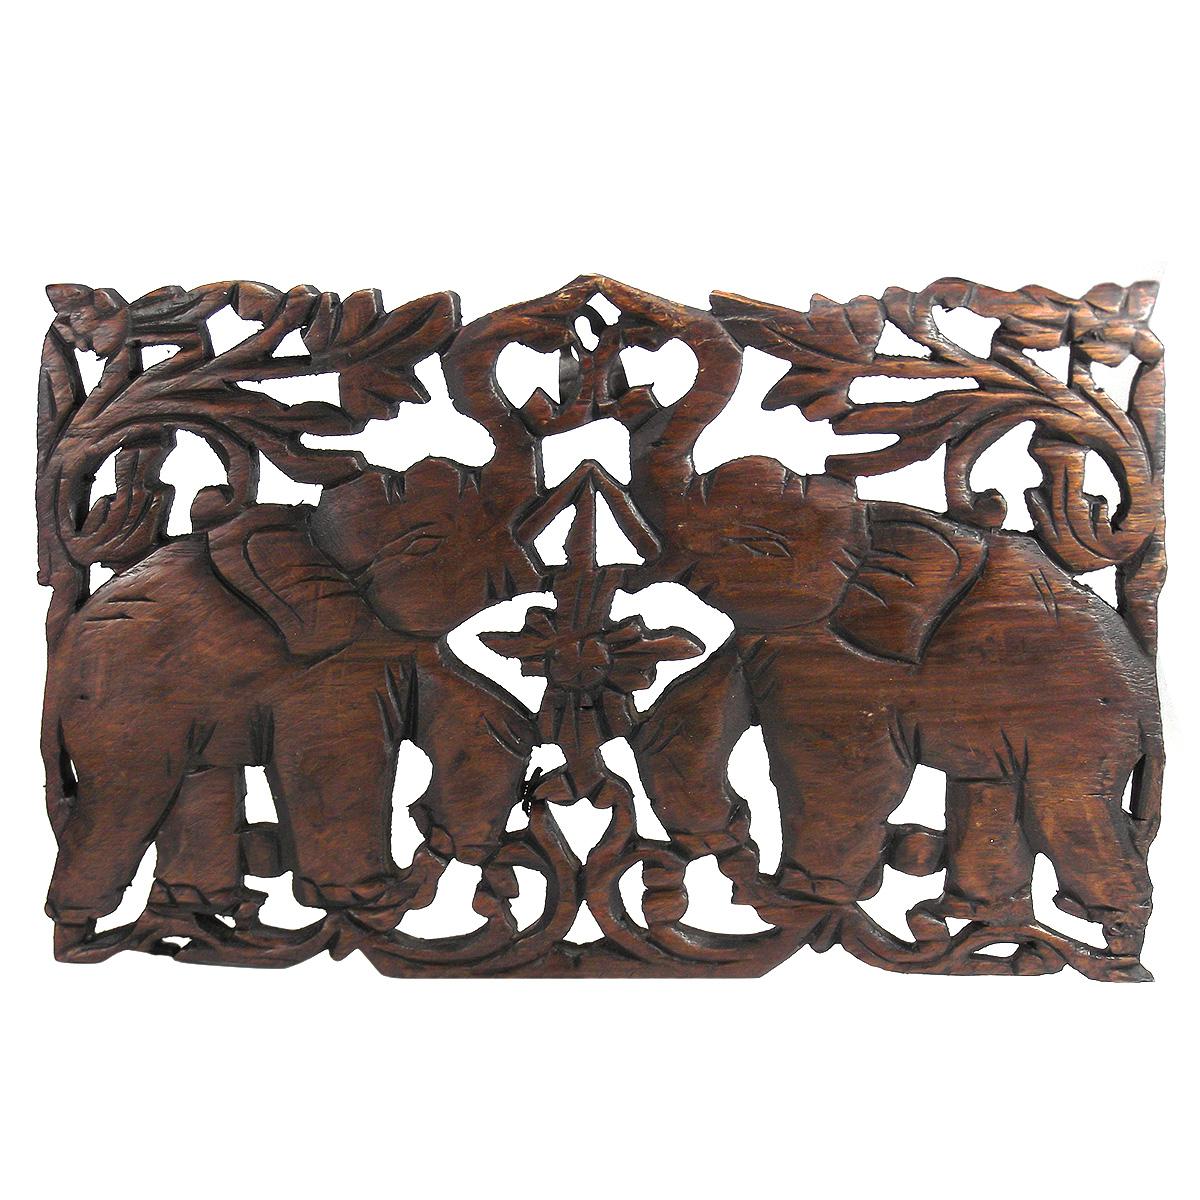 Jubilant double thai elephant calves hand carved teak wood